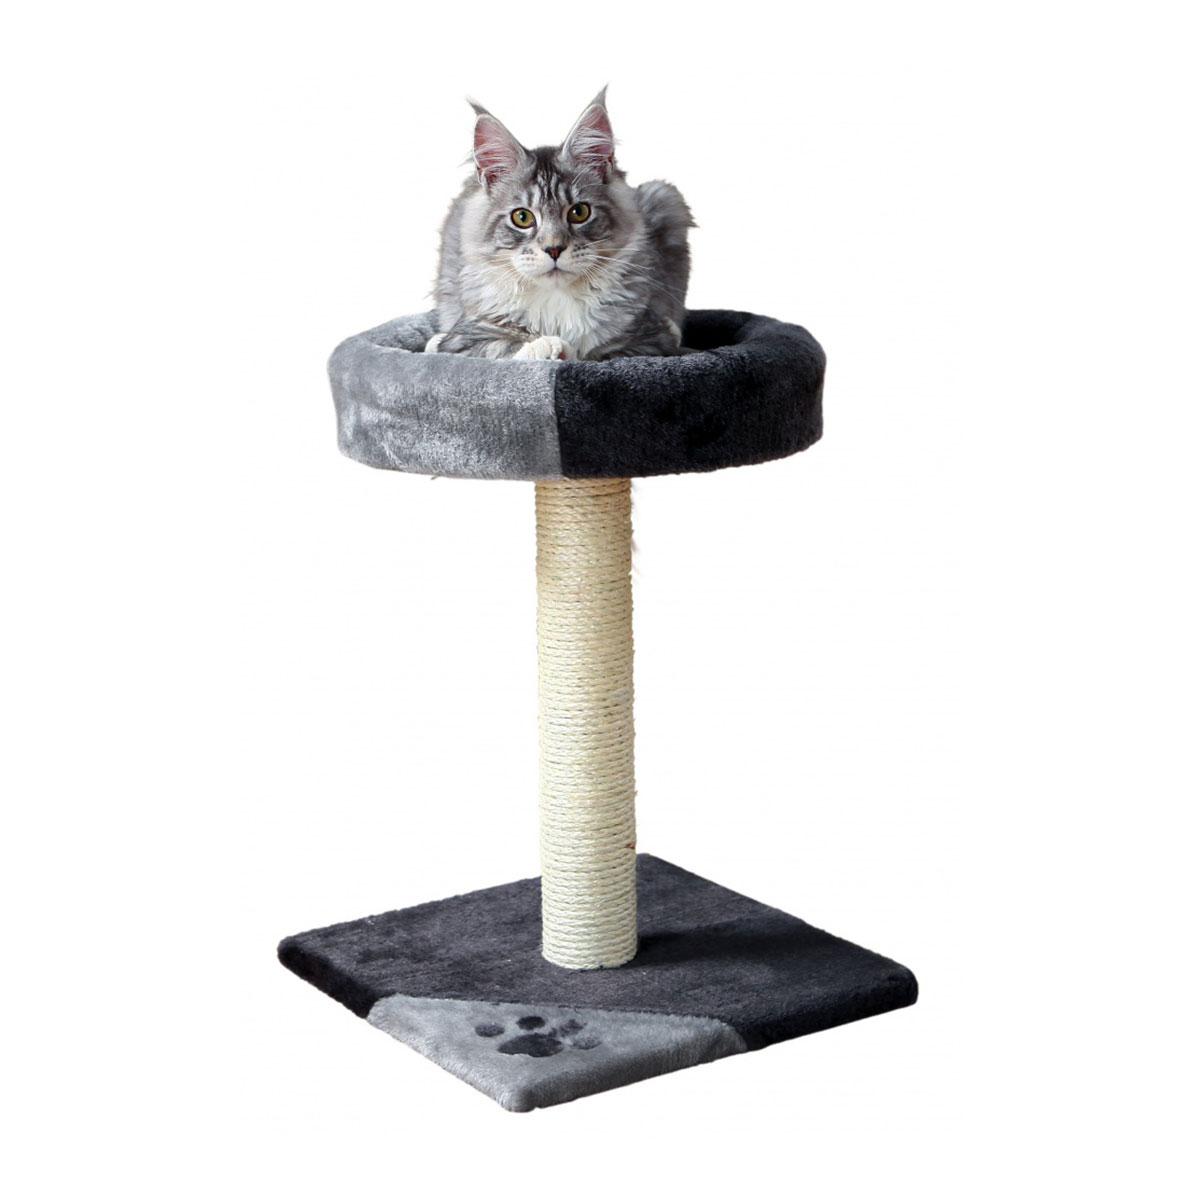 trixie kratzbaum tarifa 52 cm grau schwarz kaufen bei zooroyal. Black Bedroom Furniture Sets. Home Design Ideas